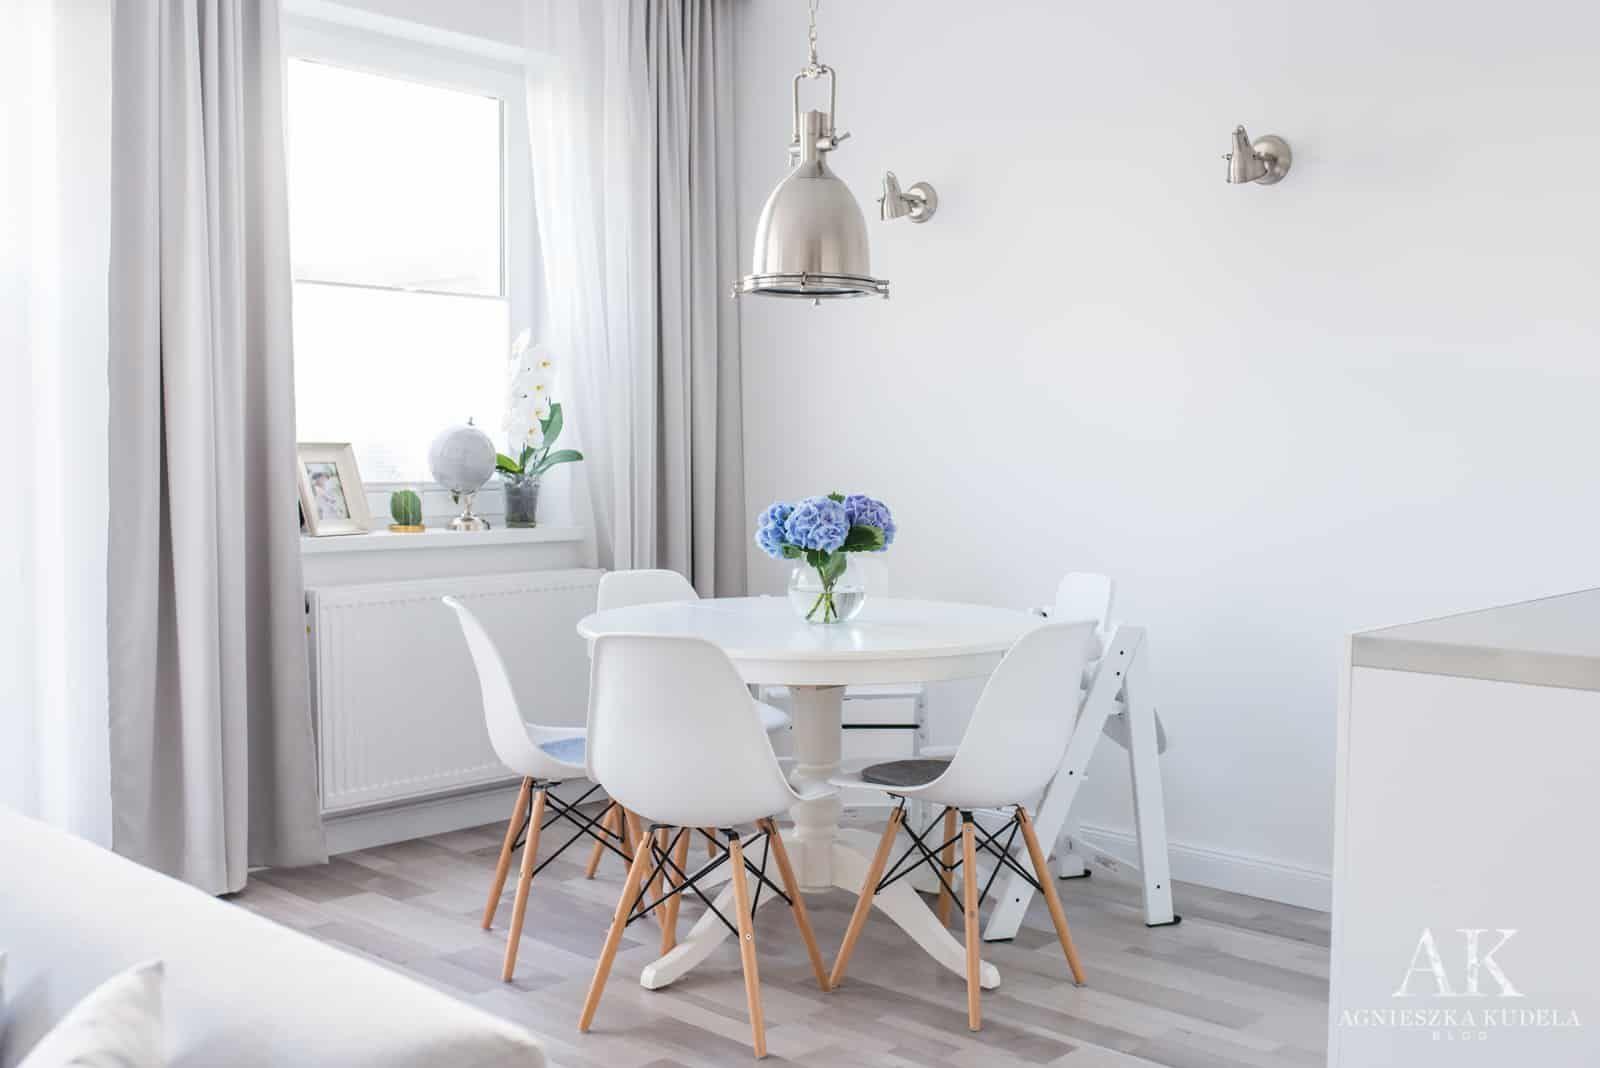 Jadalnia W Stylu Hamptons Nowojorskim Hamptons New York Style Dining Room Szare Zaslony Grey Curtains Majgull Jas Esszimmer Inspiration Wohnung Wohnen